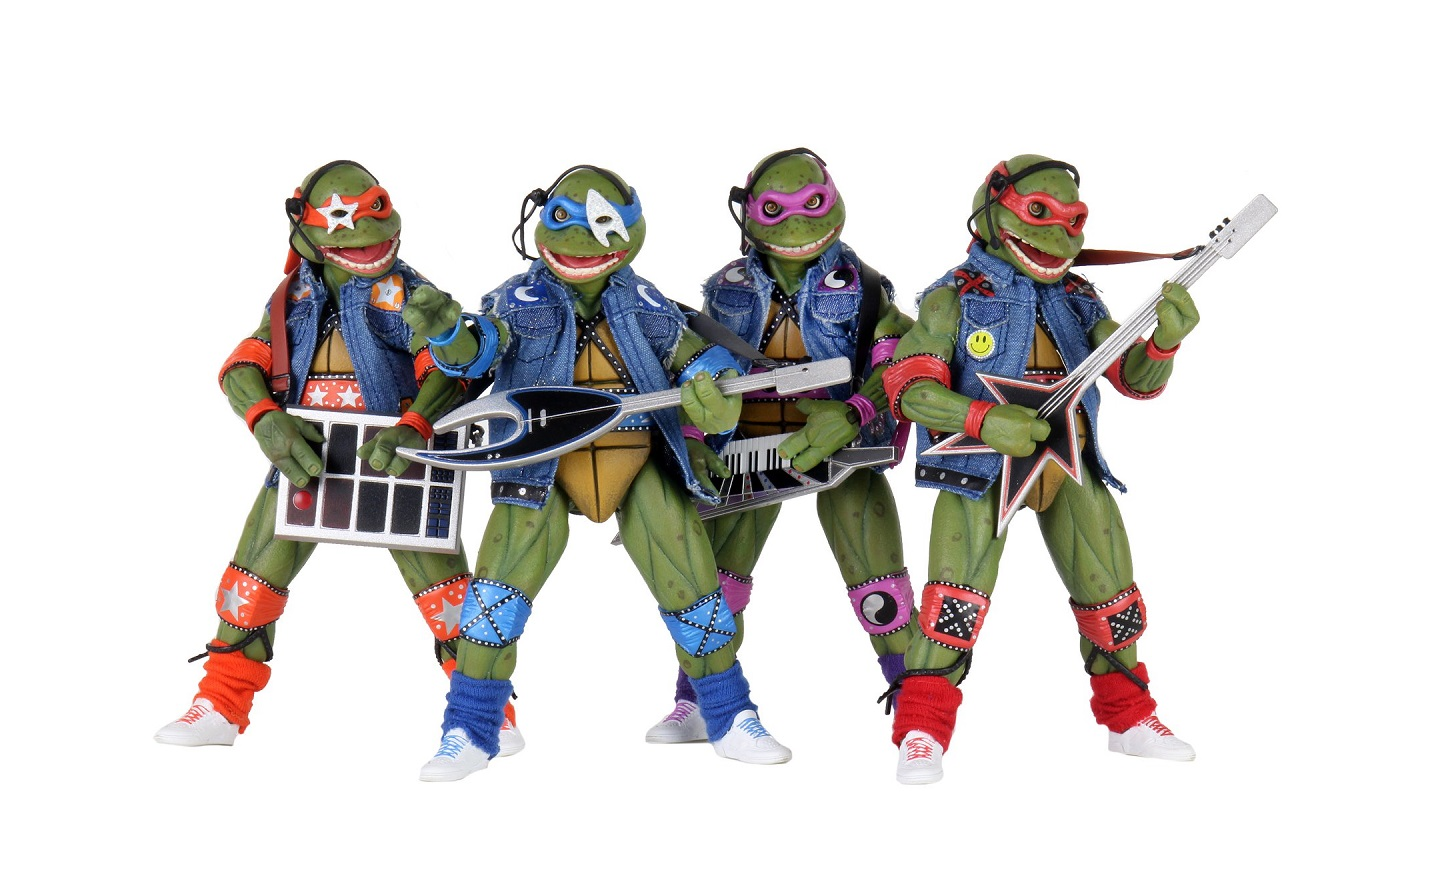 Teenage Mutant Ninja Turtles:1990:Accessory:Mutagen Man GUN